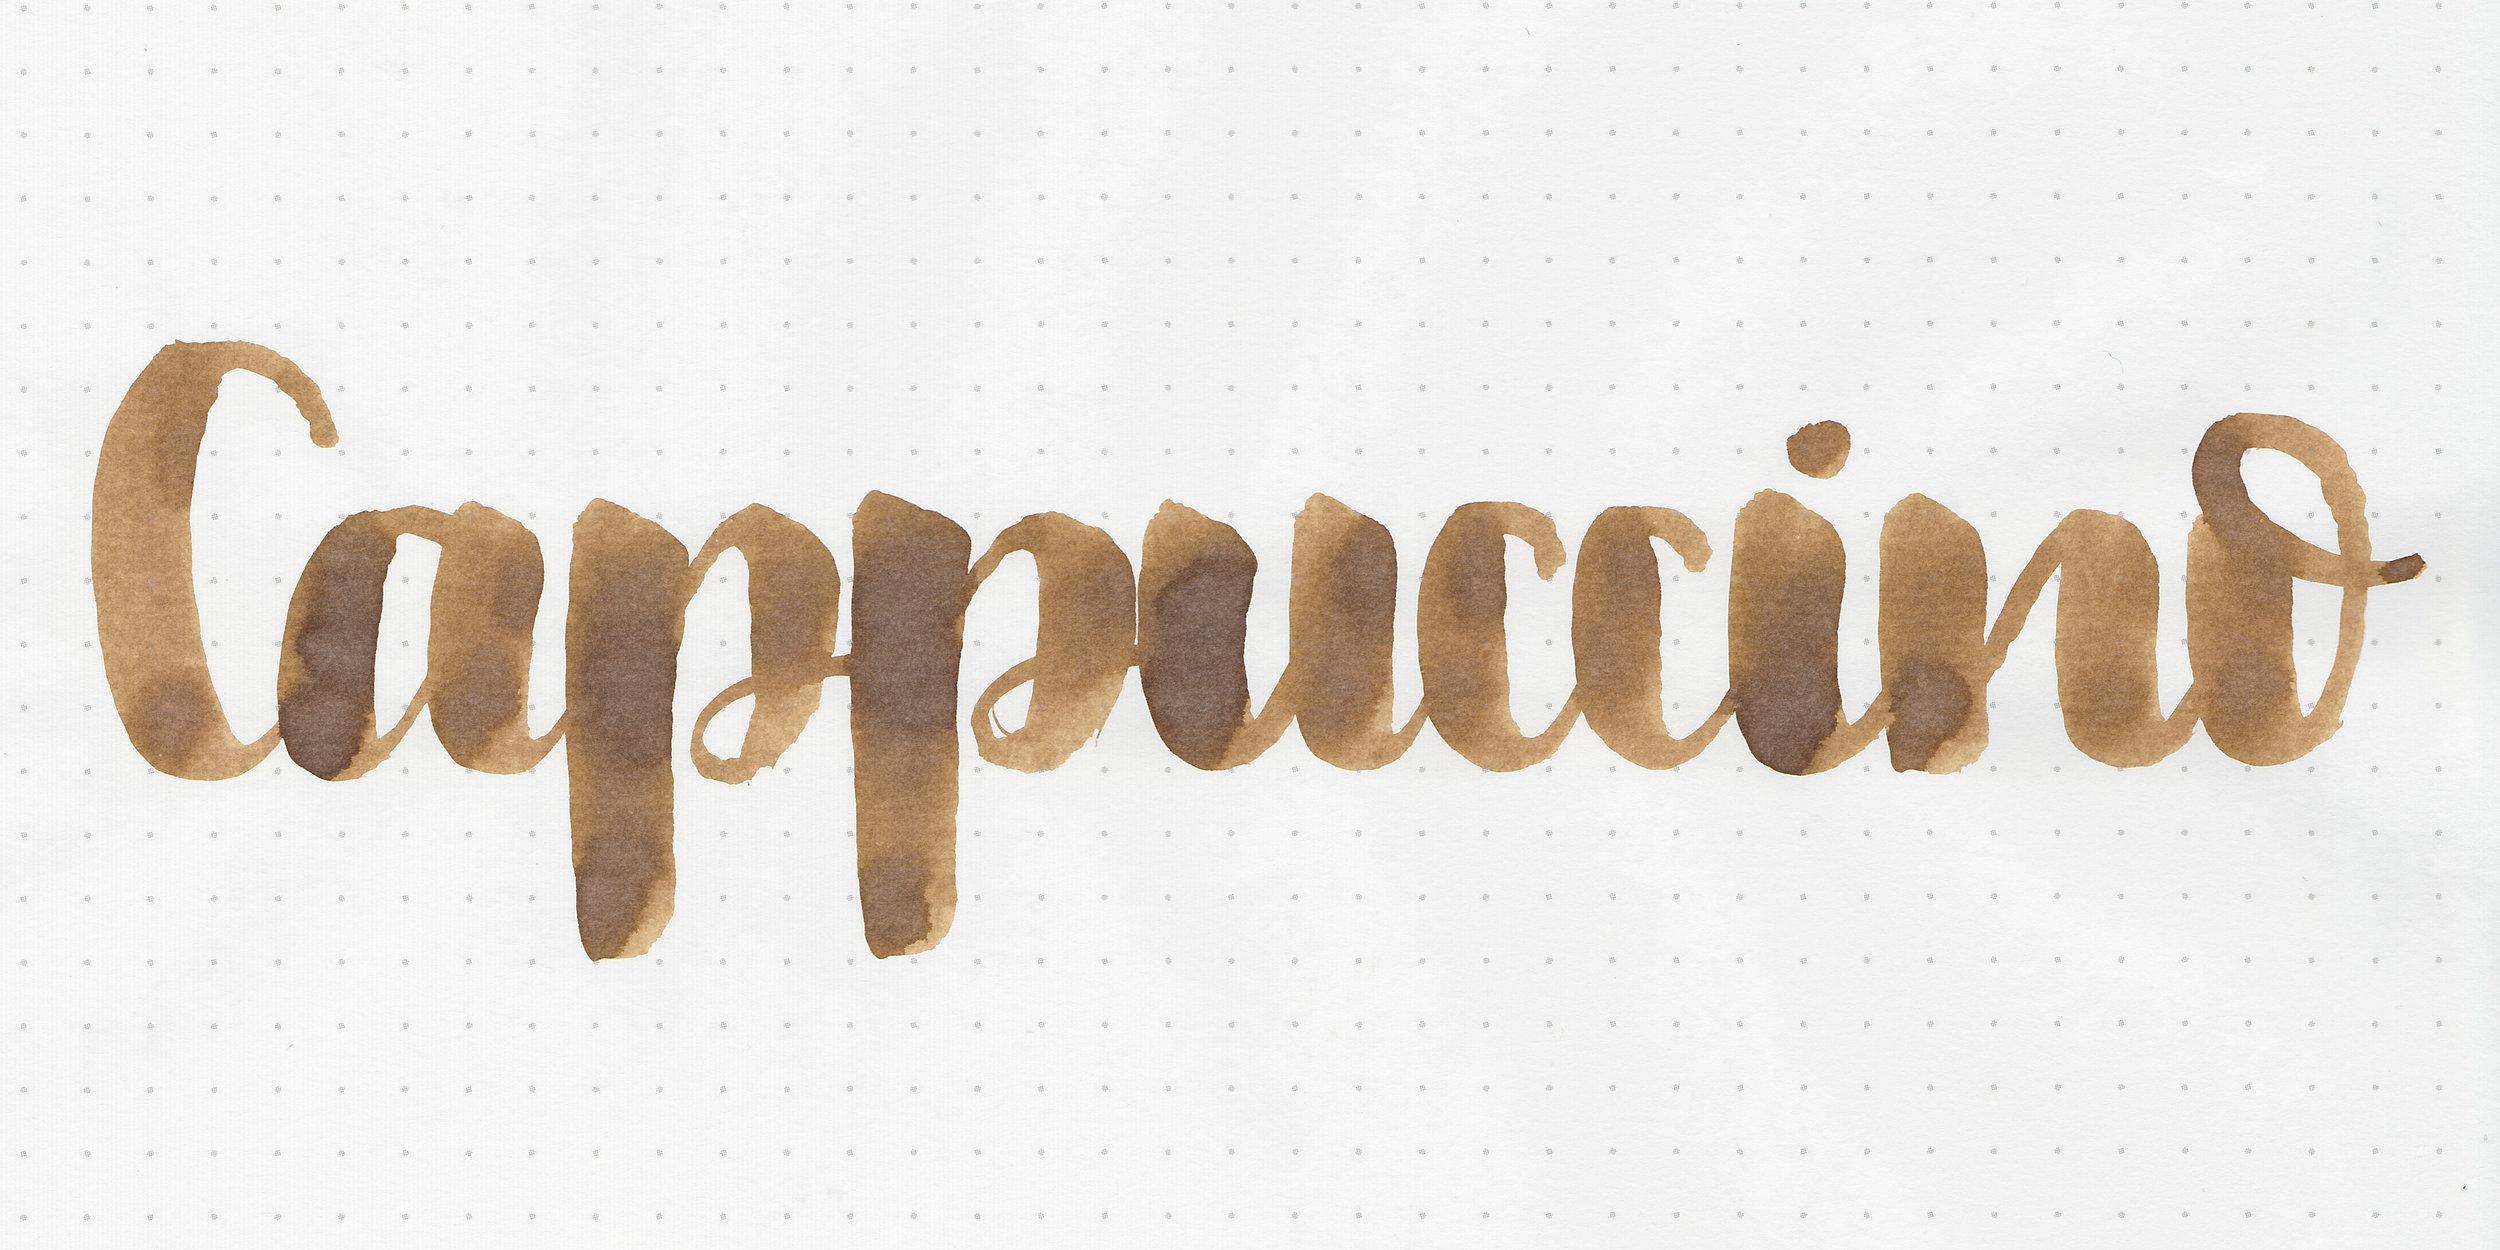 kwz-cappuccino-2.jpg